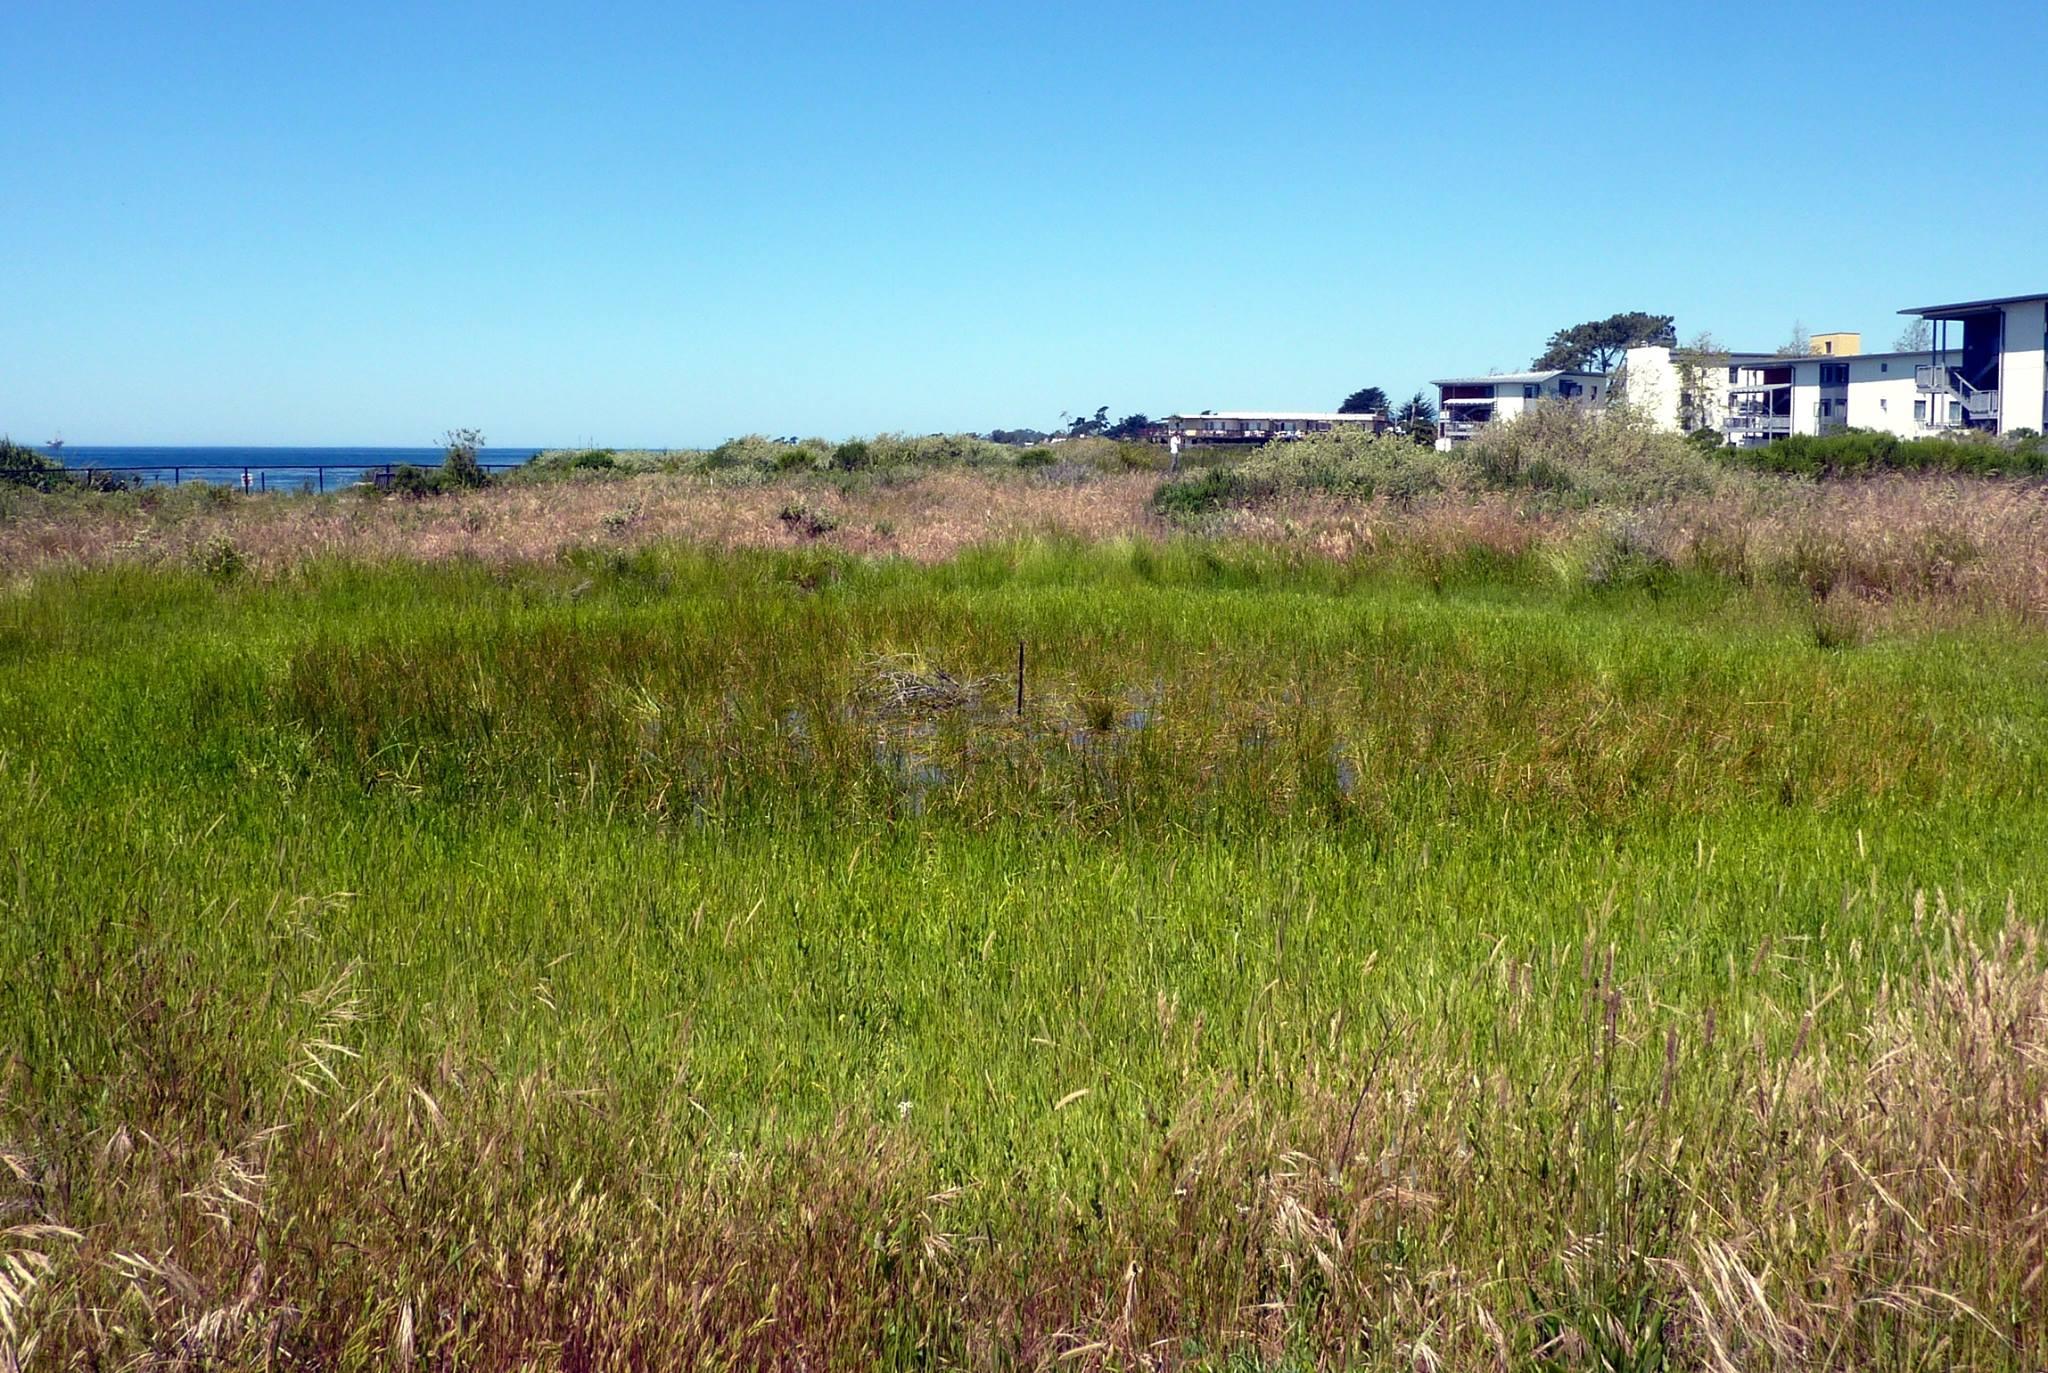 Santa Barbara wetlands. Image courtesy of Cheadle Center for Biodiversity and Ecological Restoration, UC Santa Barbara